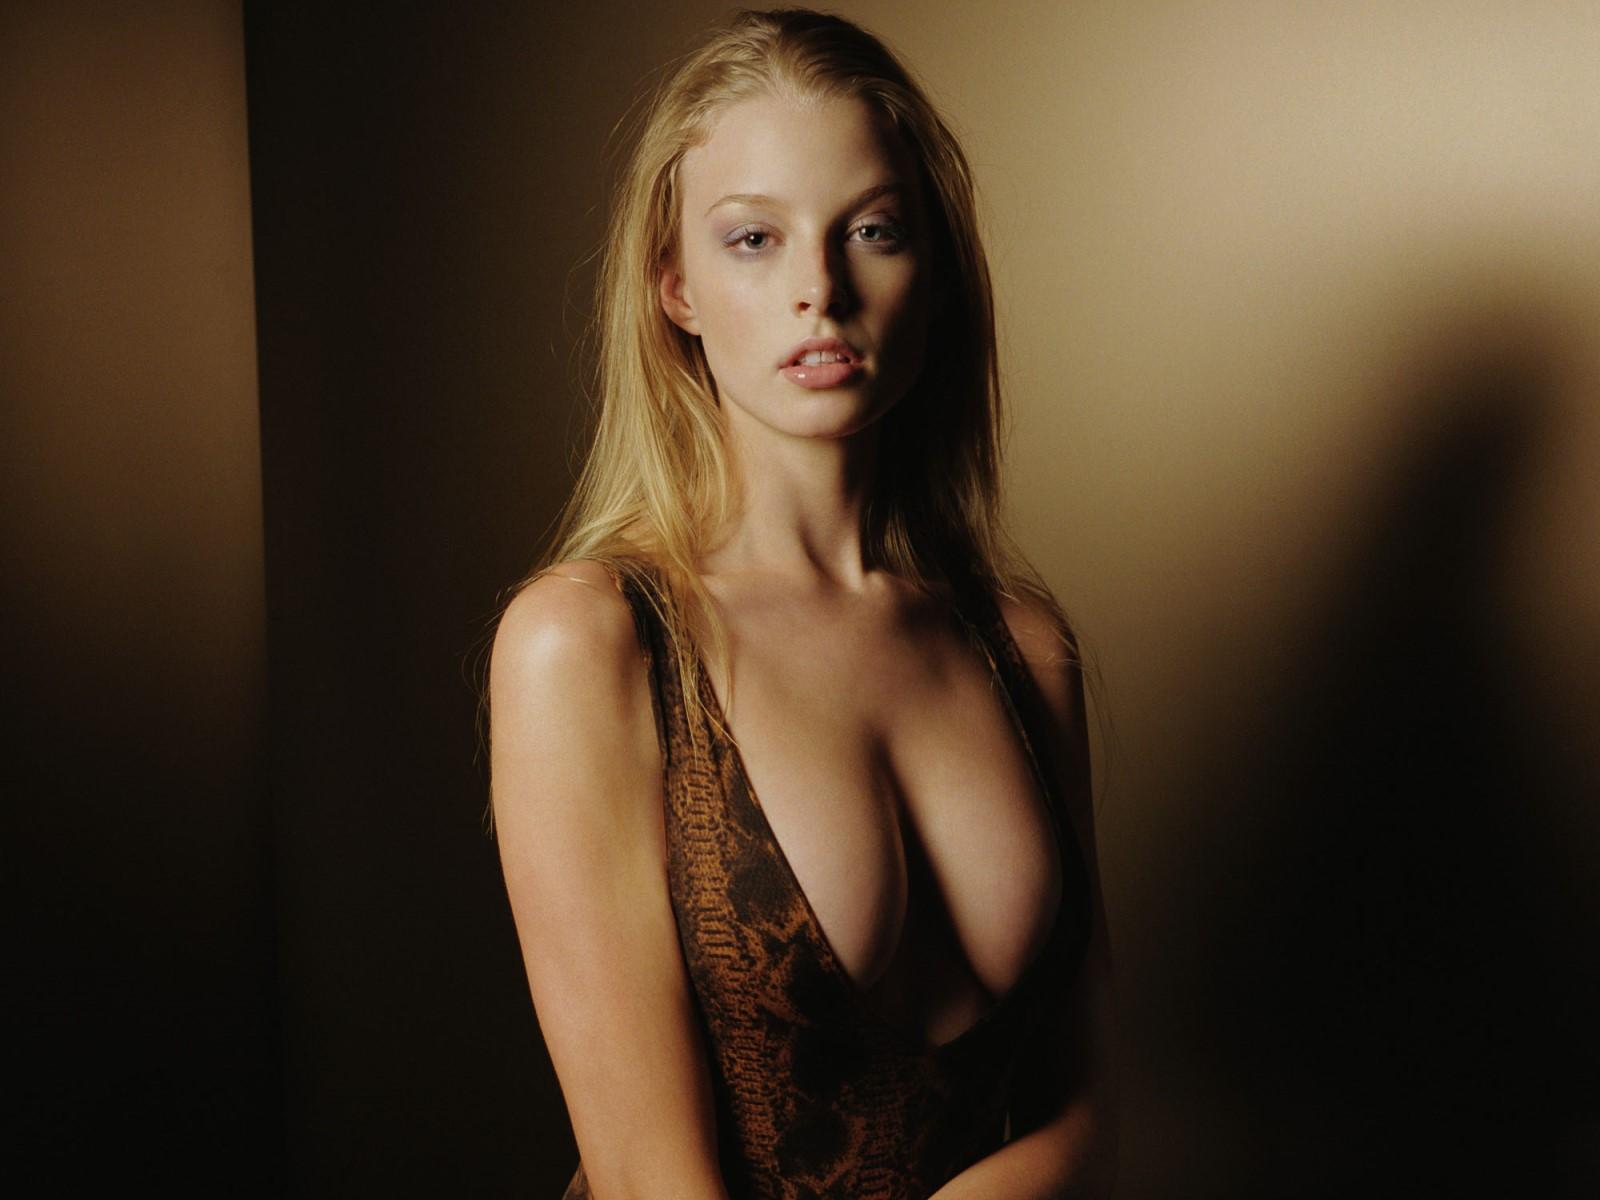 http://4.bp.blogspot.com/-UKri9IB_OlU/Te0jUWFe8zI/AAAAAAAABRU/AFVXFSexoR0/s1600/Rachel-Nichols-sexy-Wallpaper.jpg